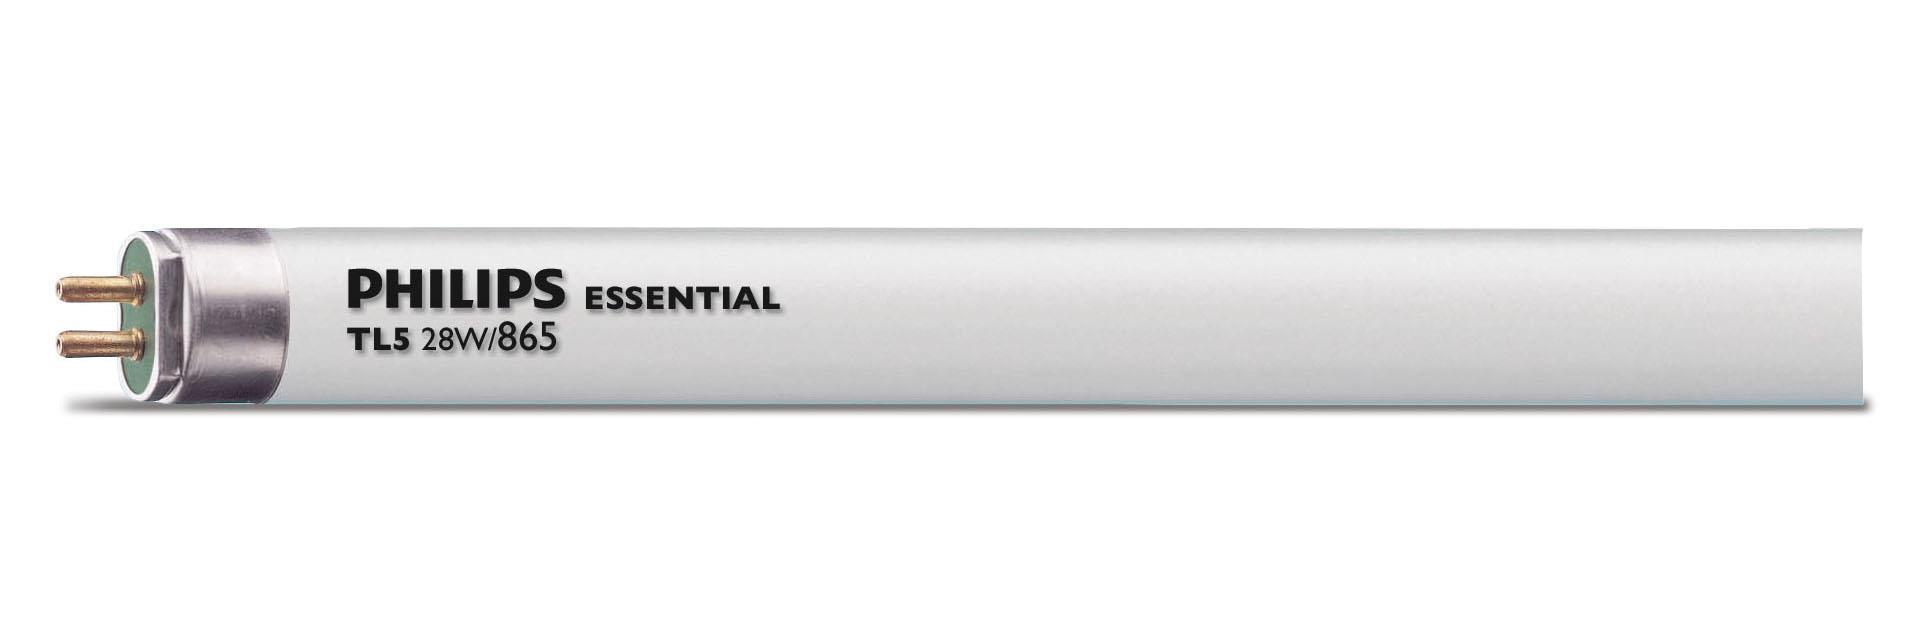 Jual Lampu Philips Tl 5 Essential 28w 830 840 865